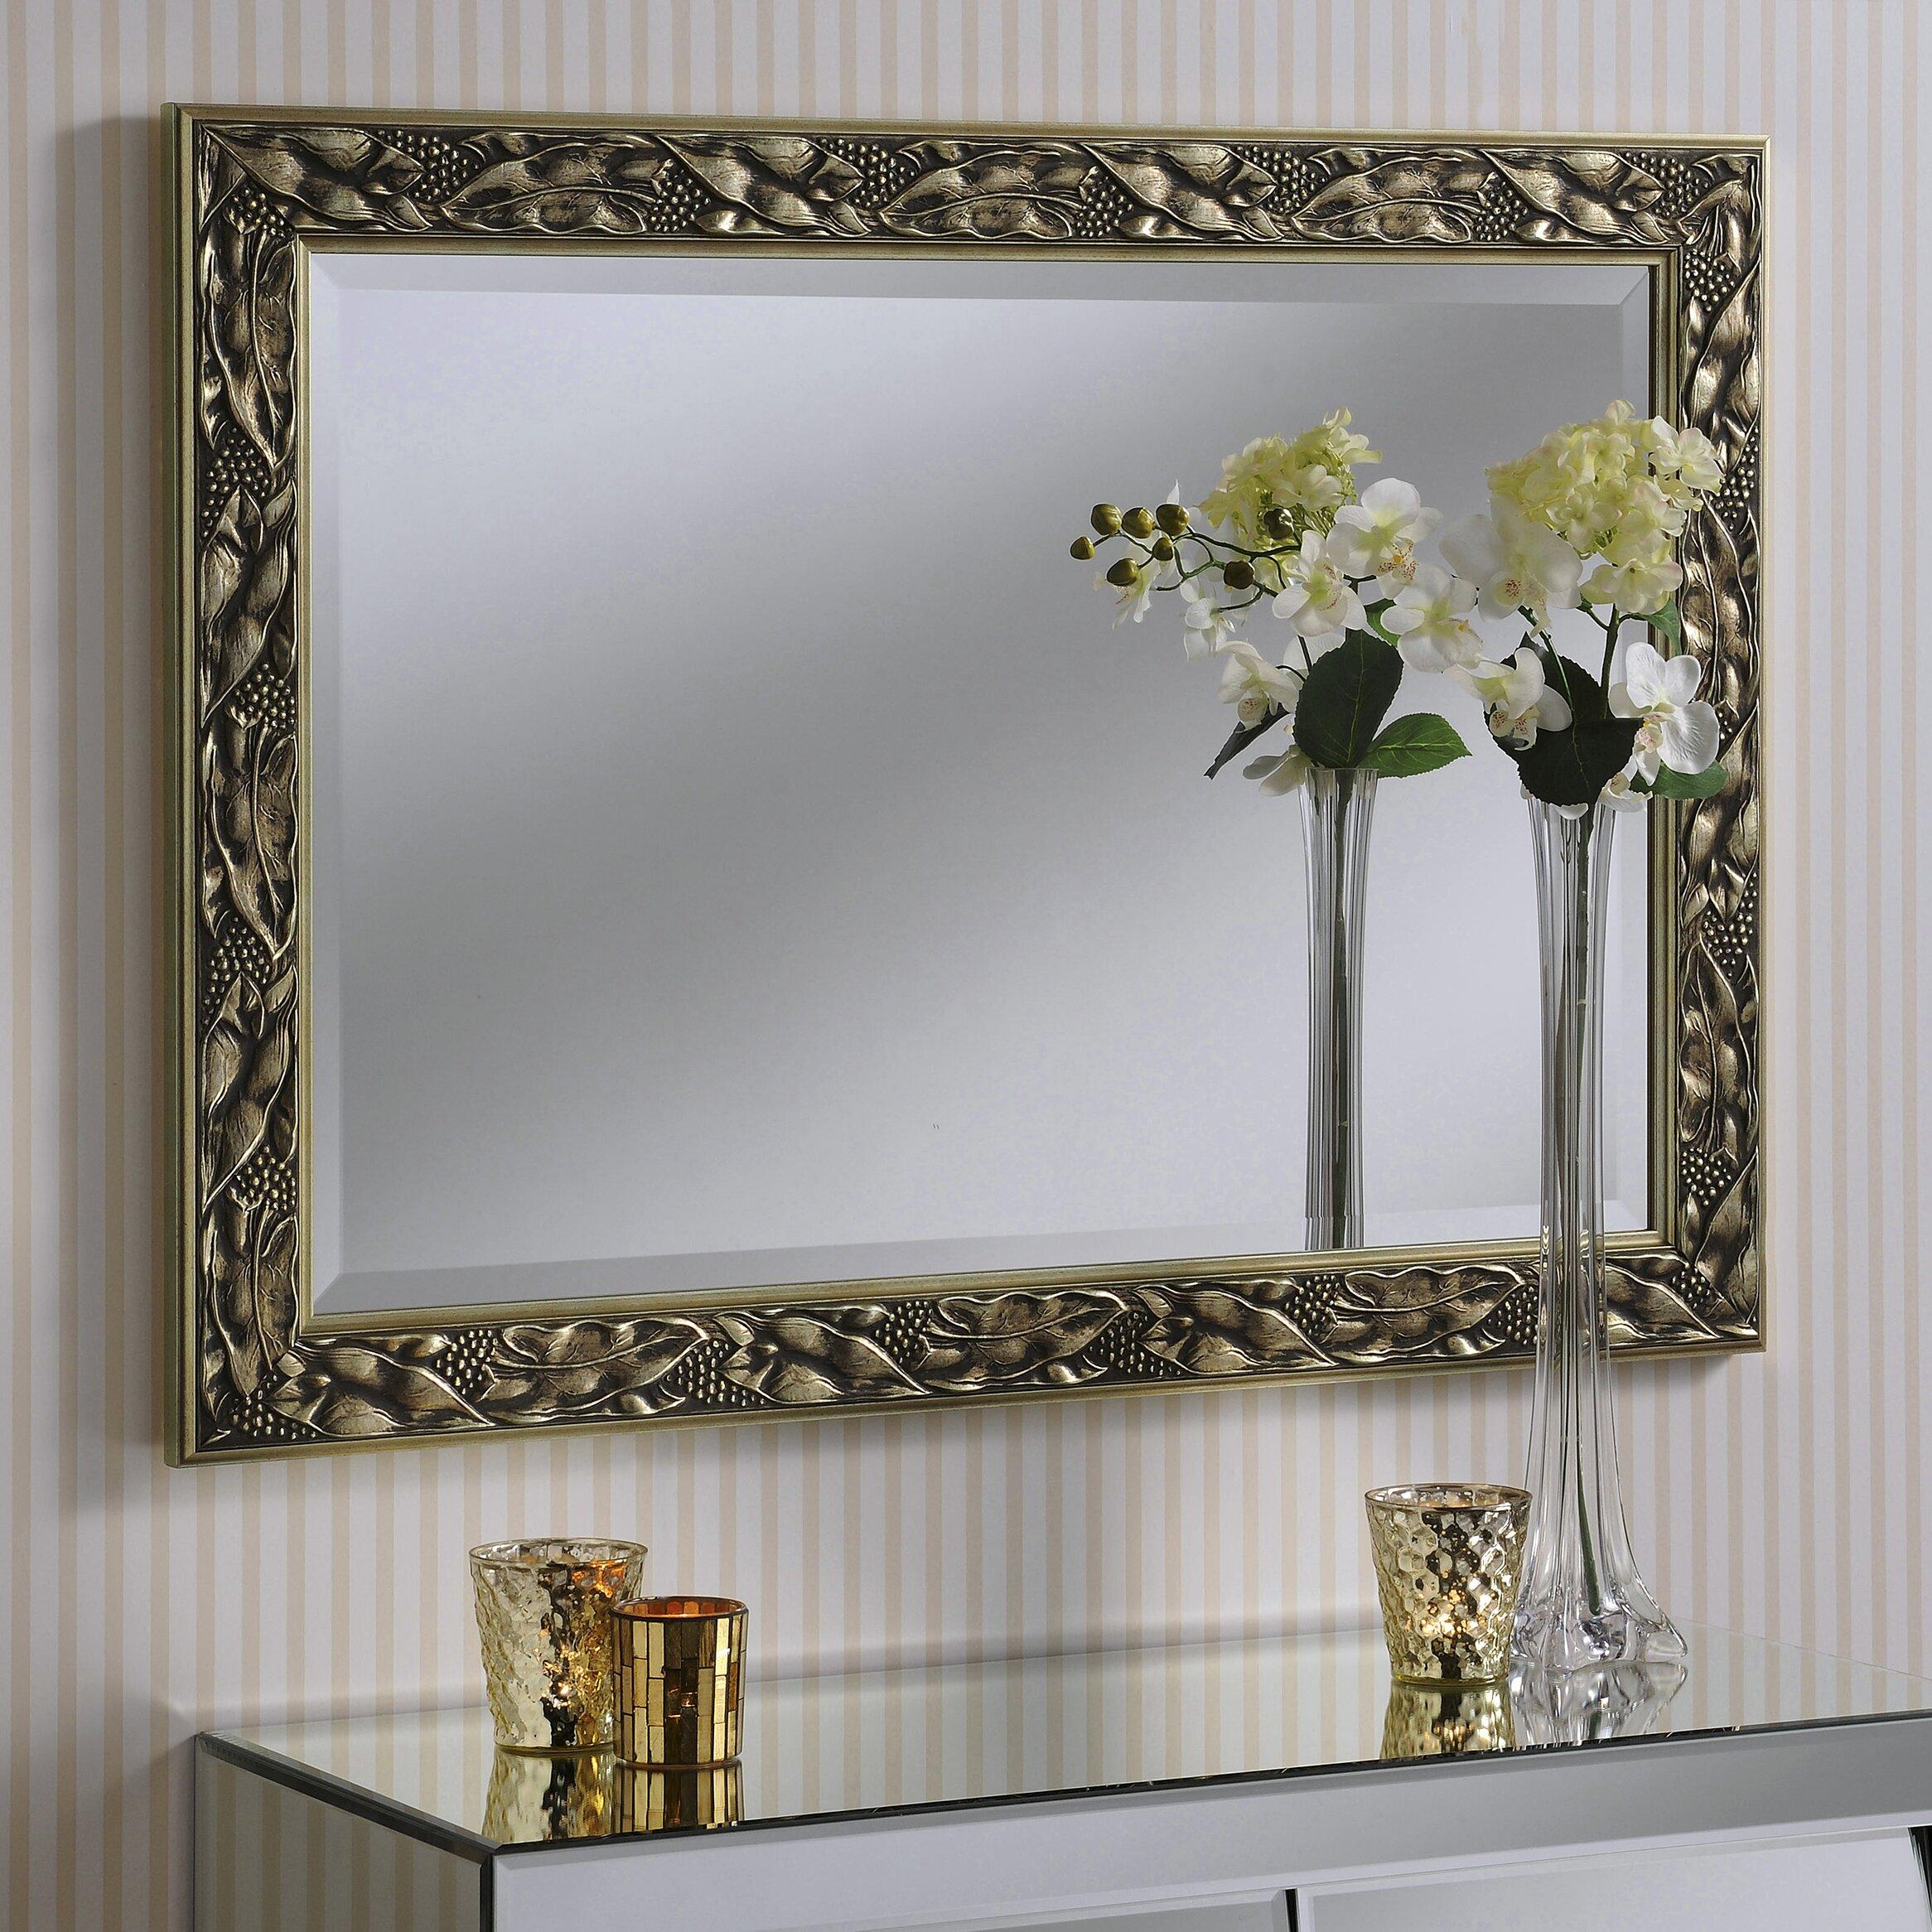 Yearn Mirrors Rectangular Mirror Amp Reviews Wayfair Co Uk